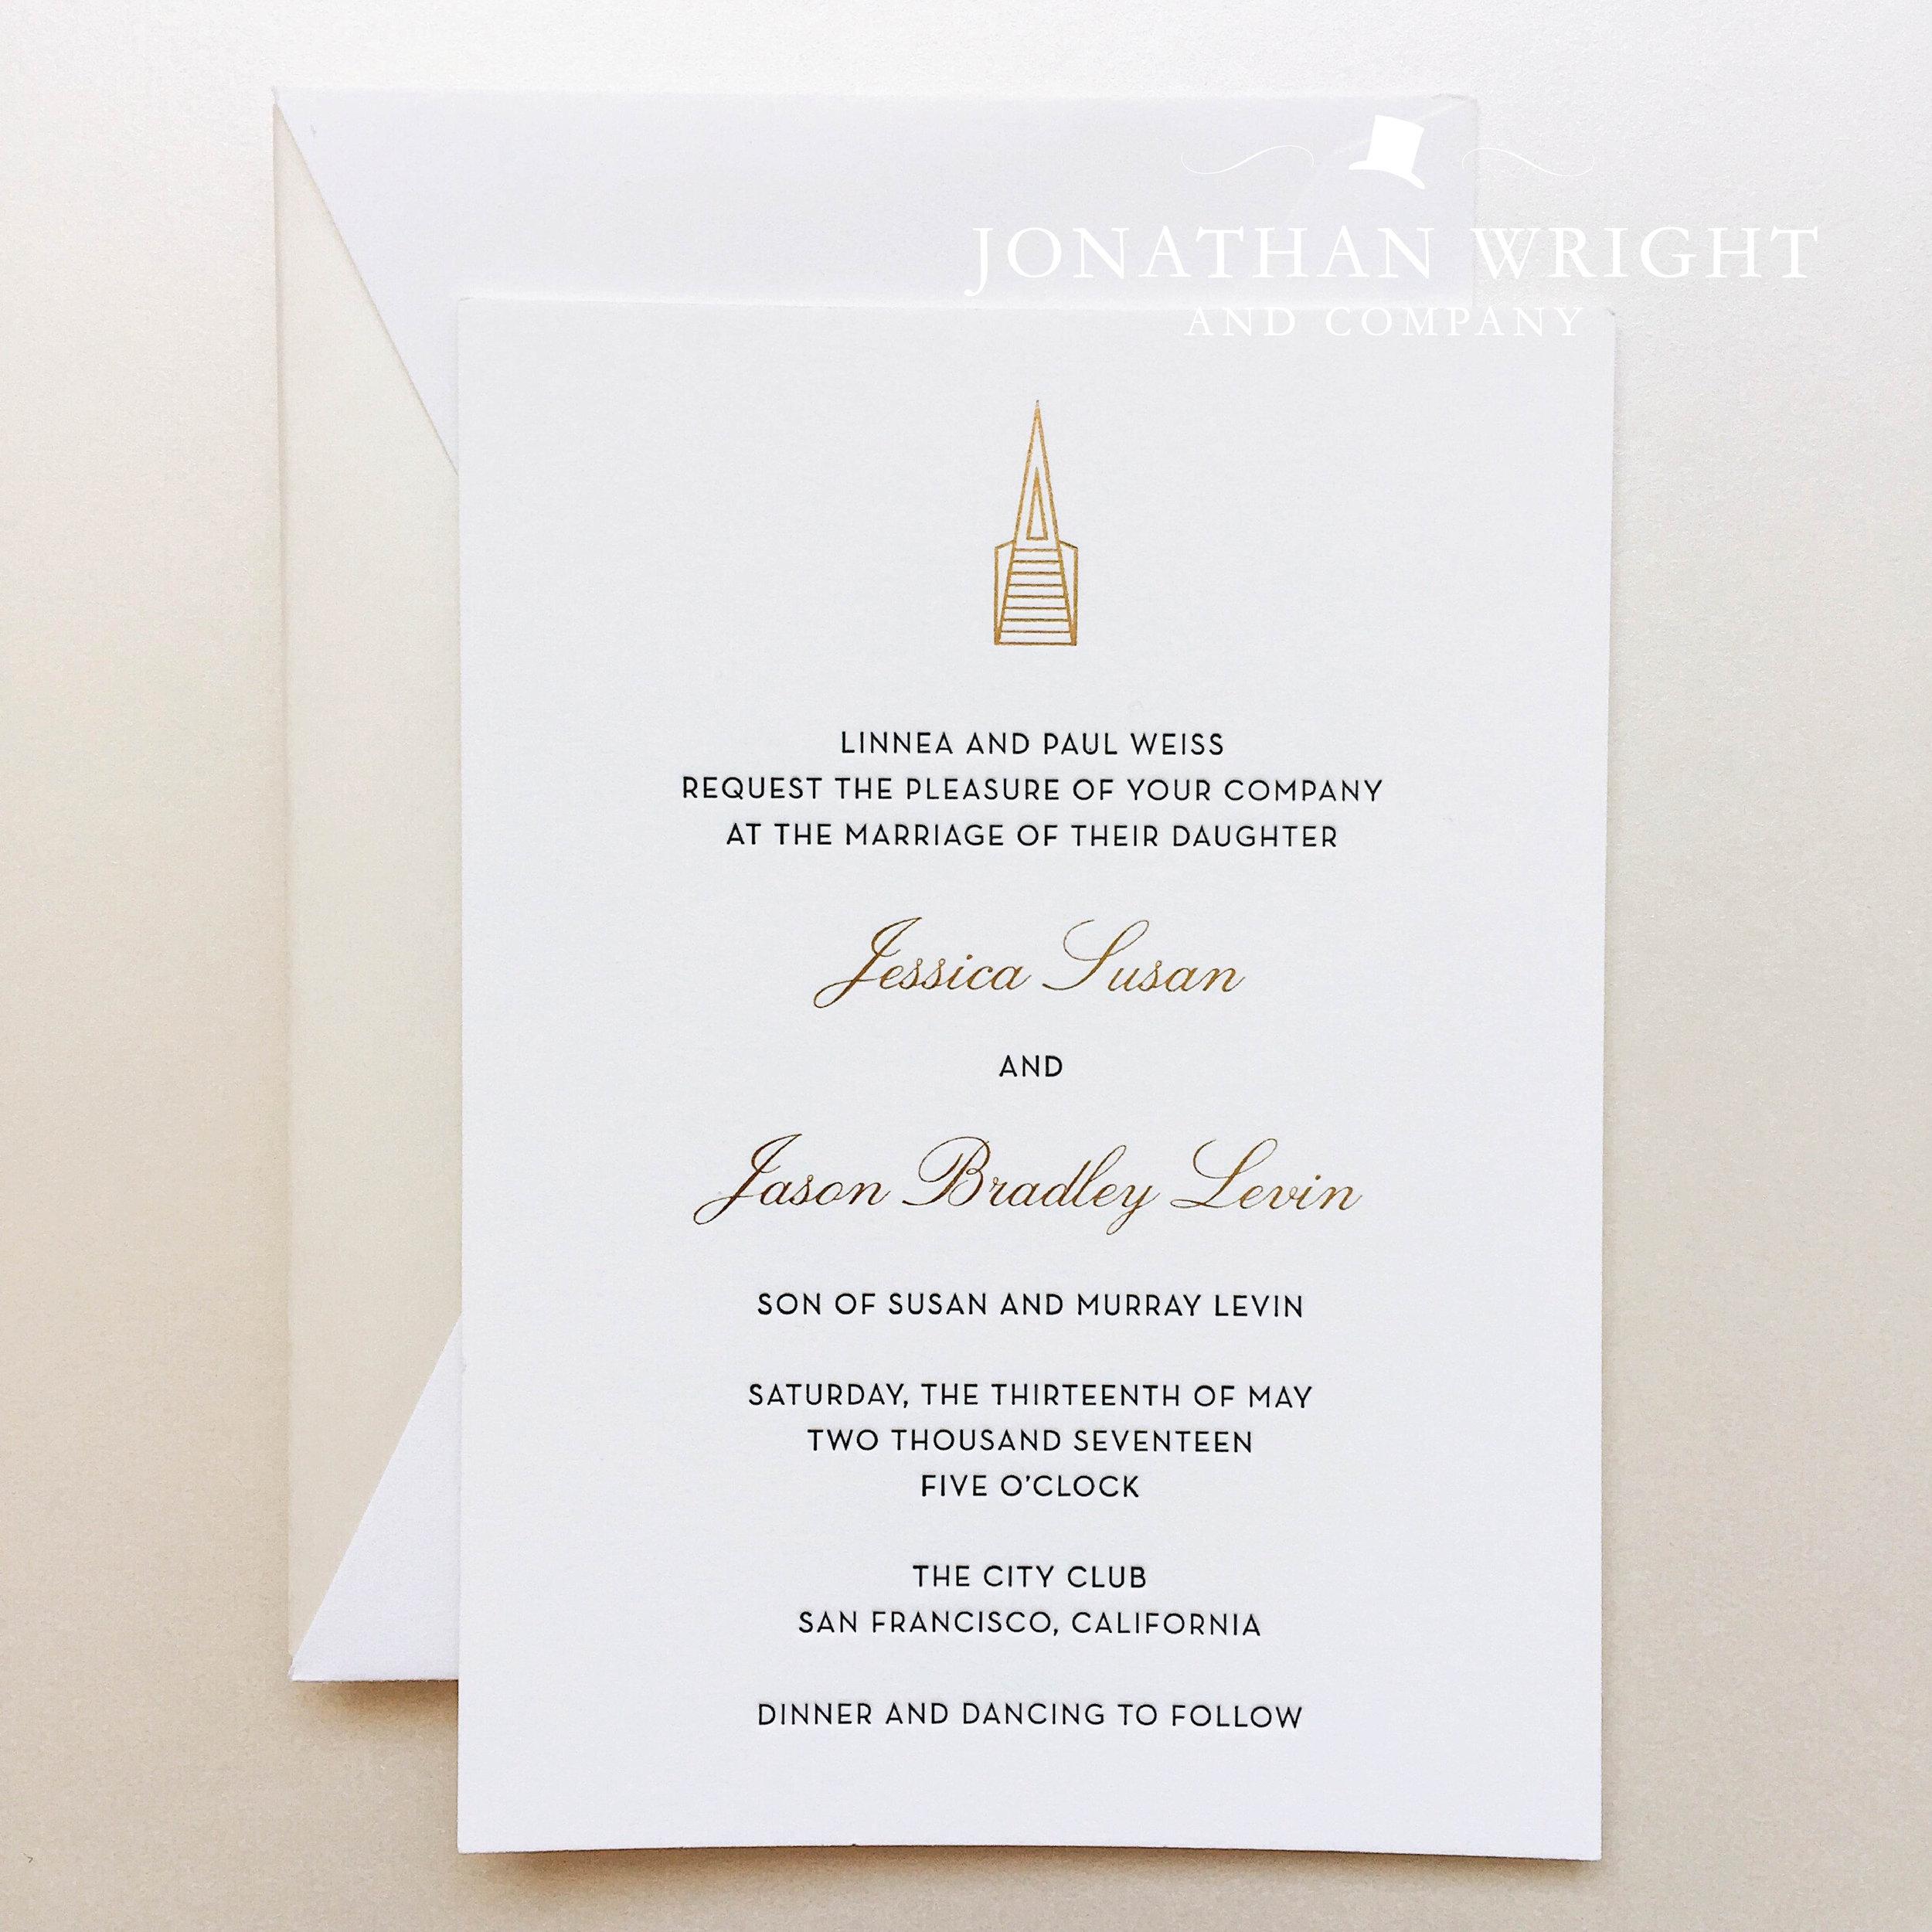 WEISS INVITATION.jpg